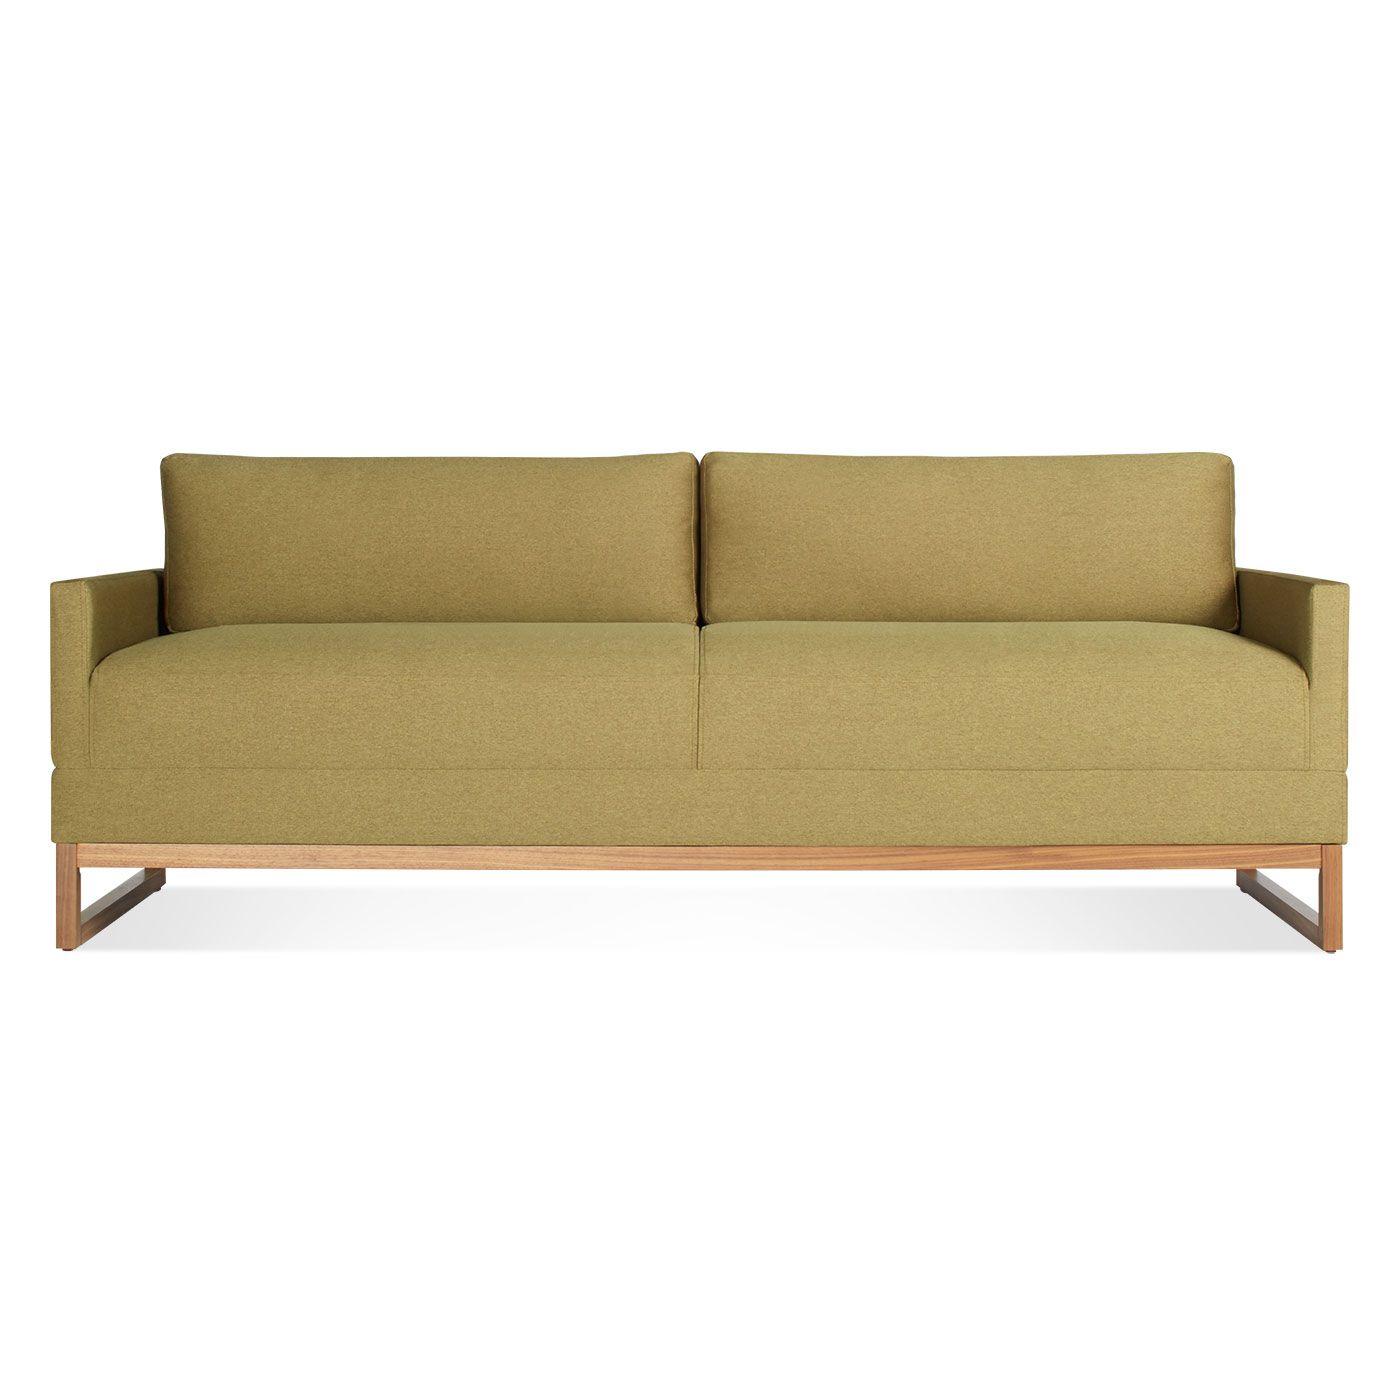 Diplomat modern sleeper sofa lady pad inspirations